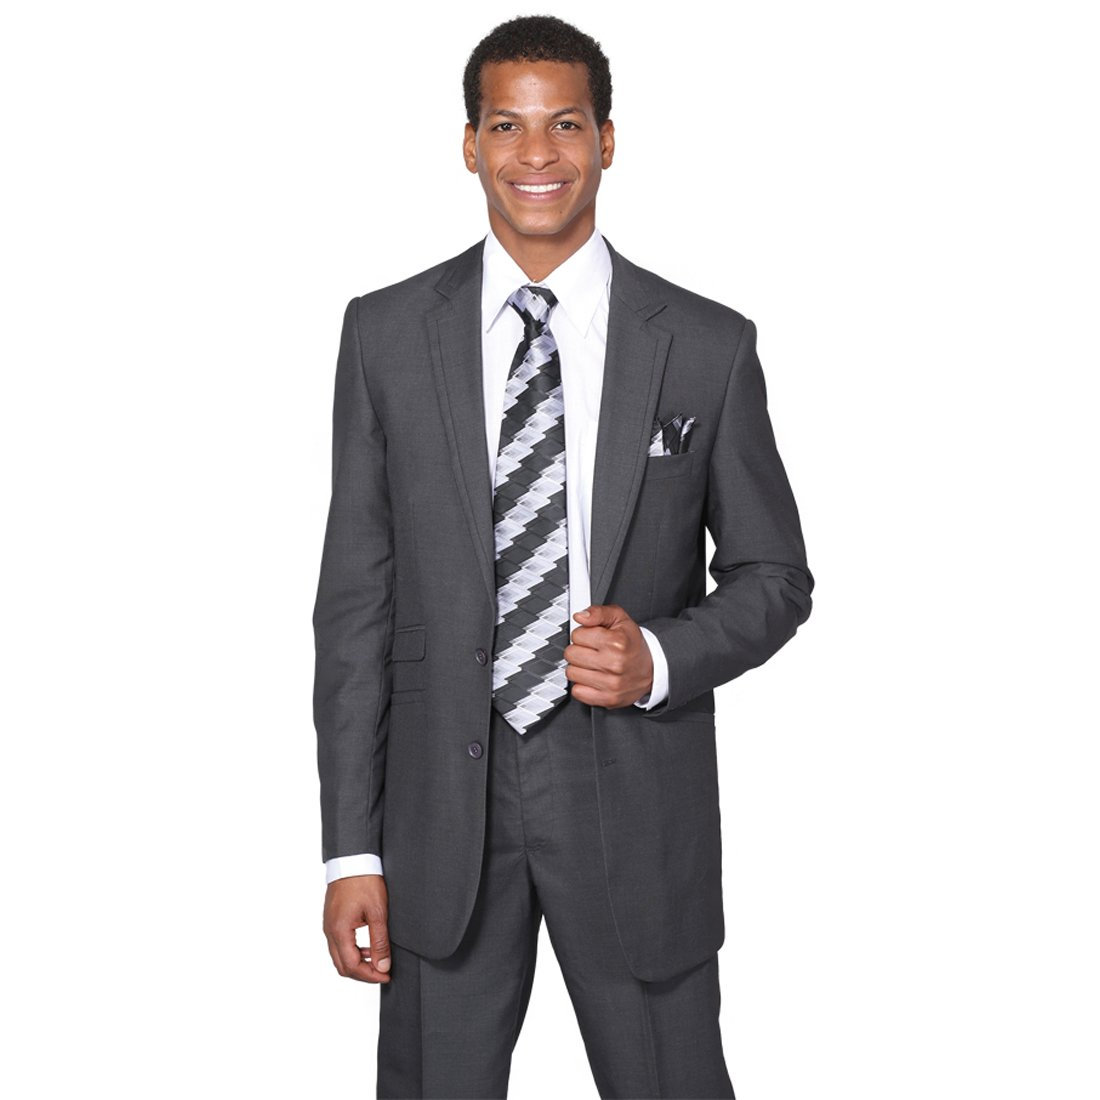 Milano Moda Men's 2 Piece Set Luxurious Wool Feel Suit HLMD5702K New York Brand